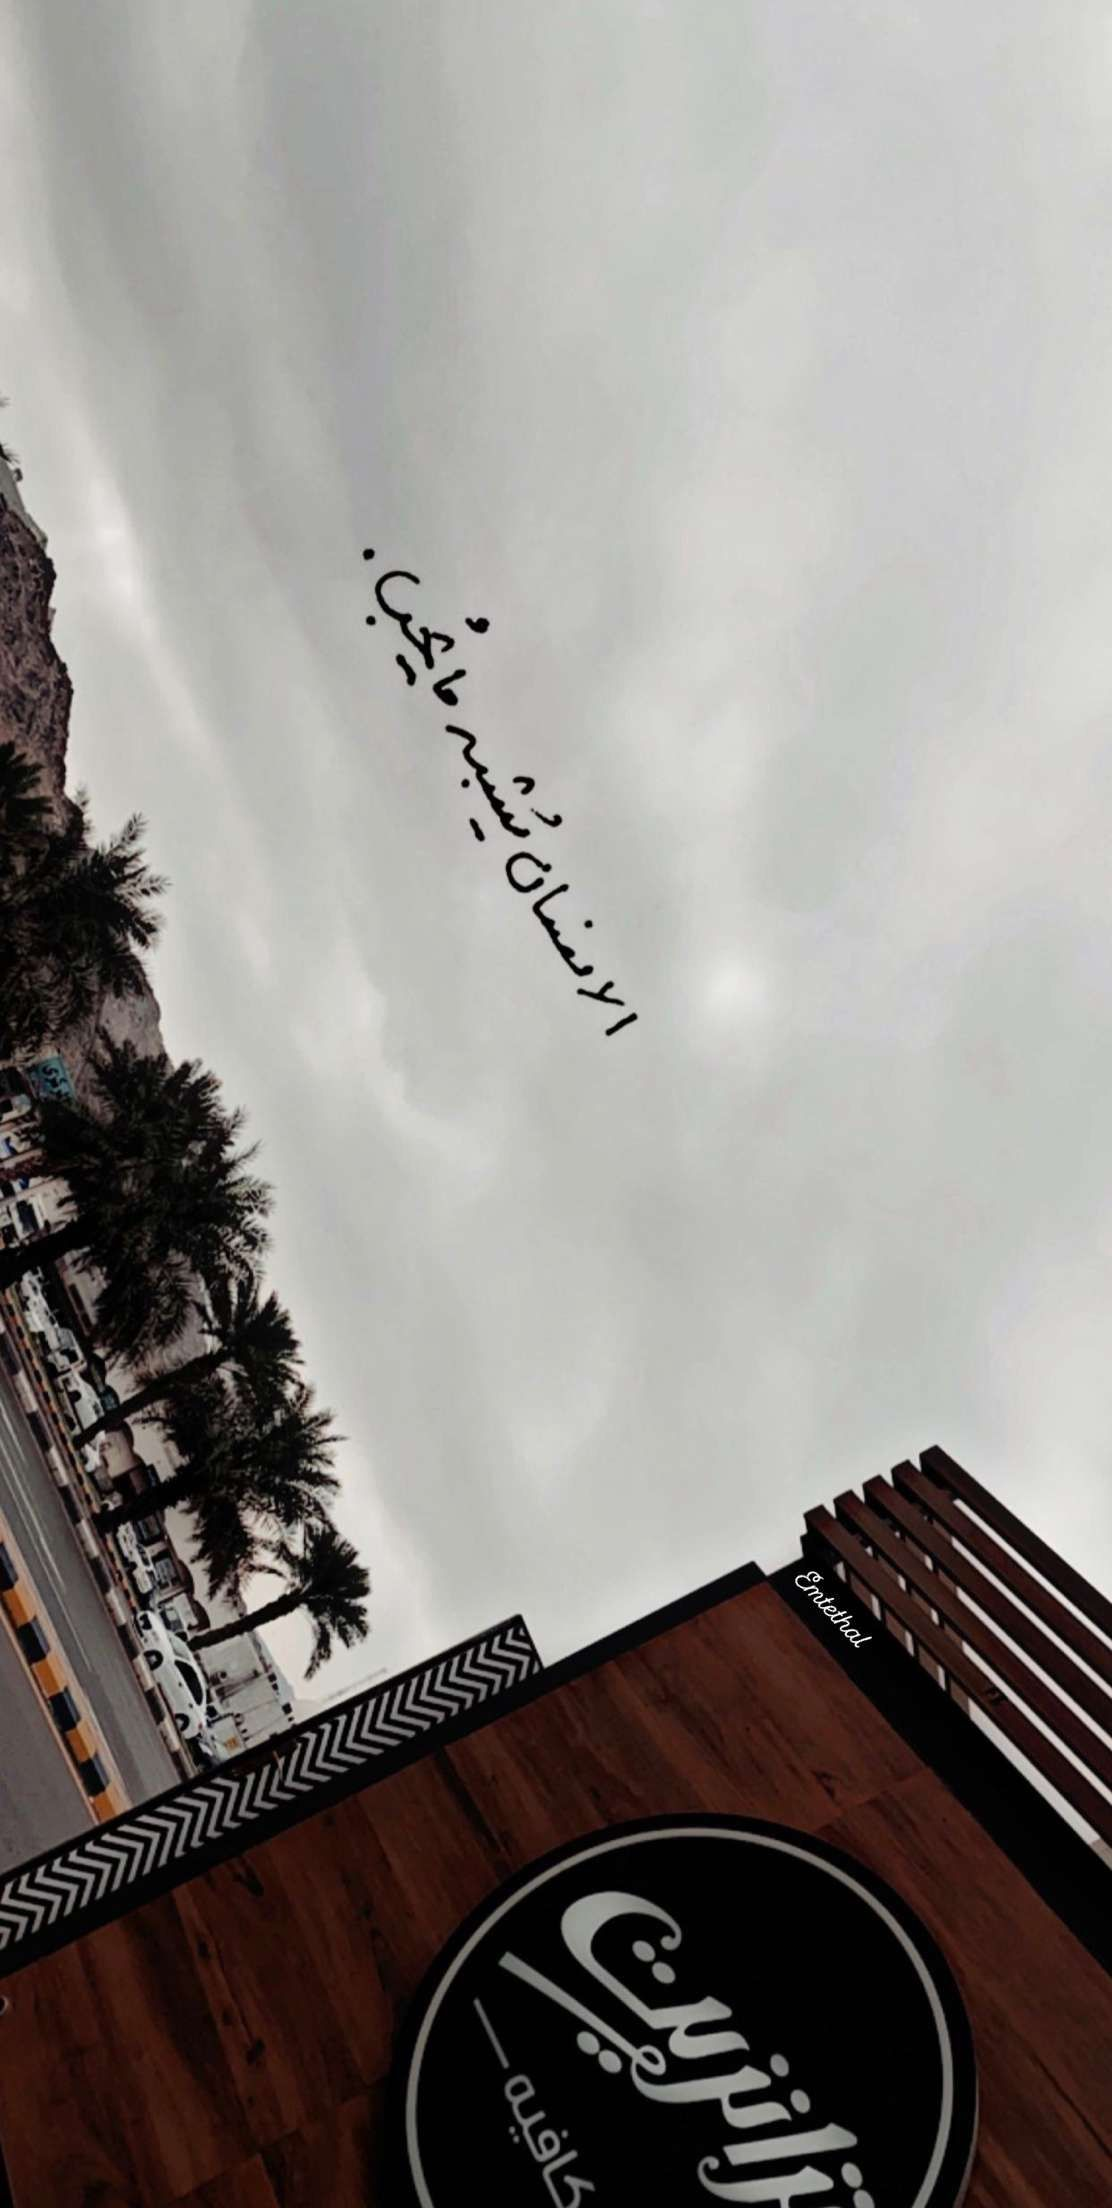 الانسان يشبه ما يحب Islamic Art Calligraphy Story Ideas Pictures Photo Quotes